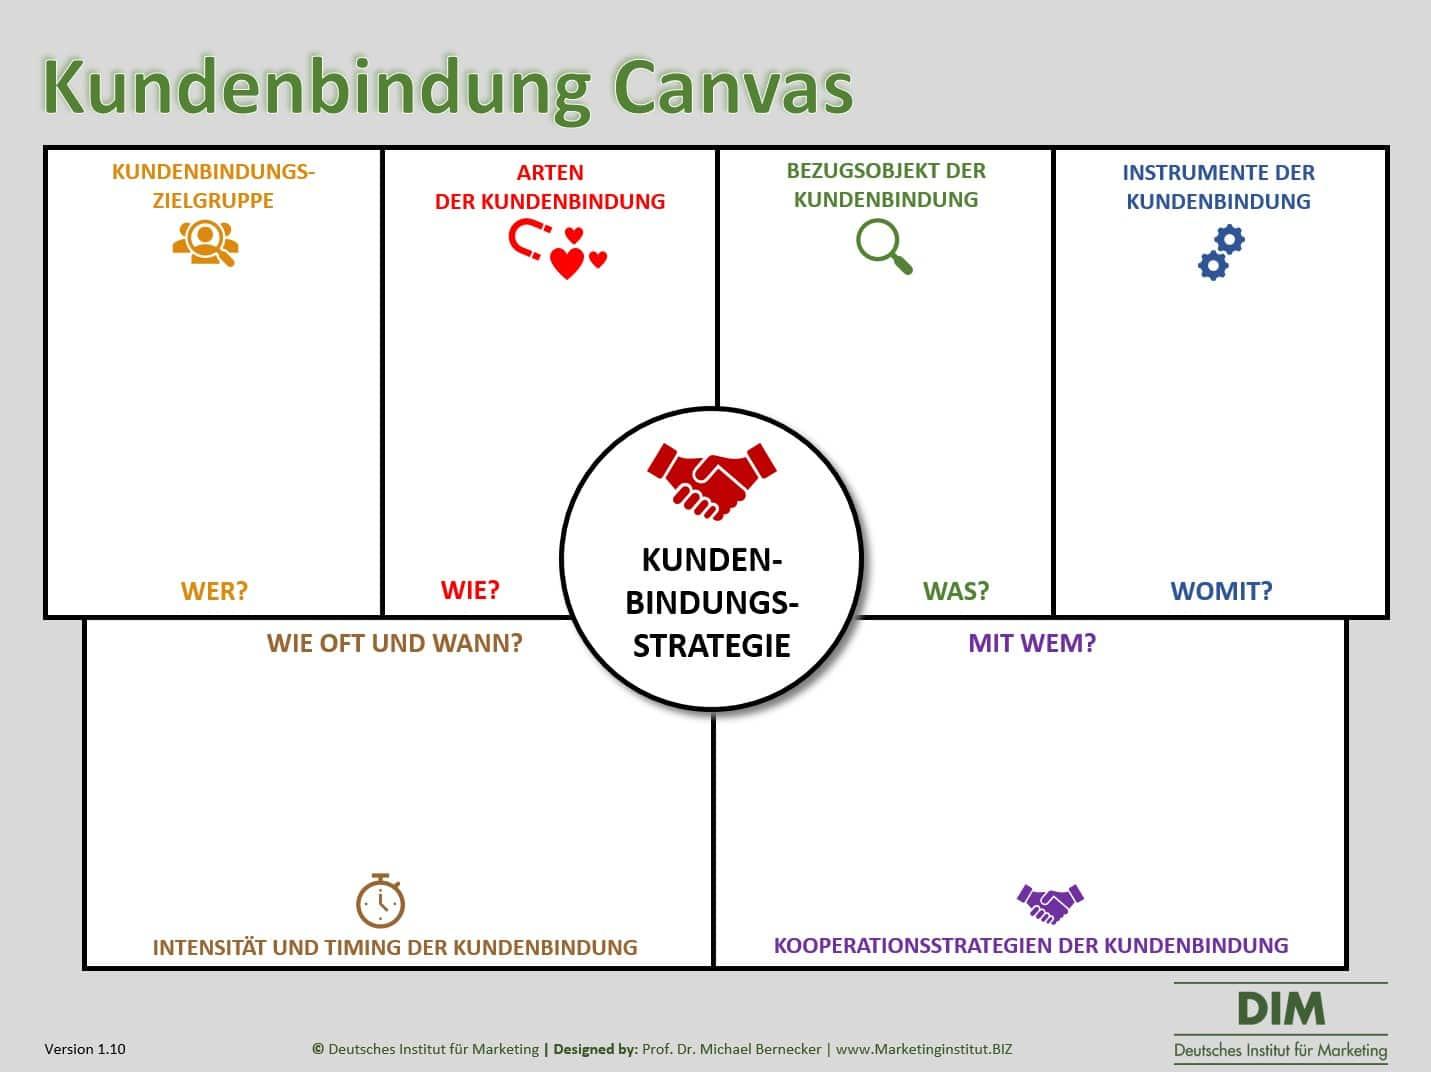 Kundenbindung Canvas